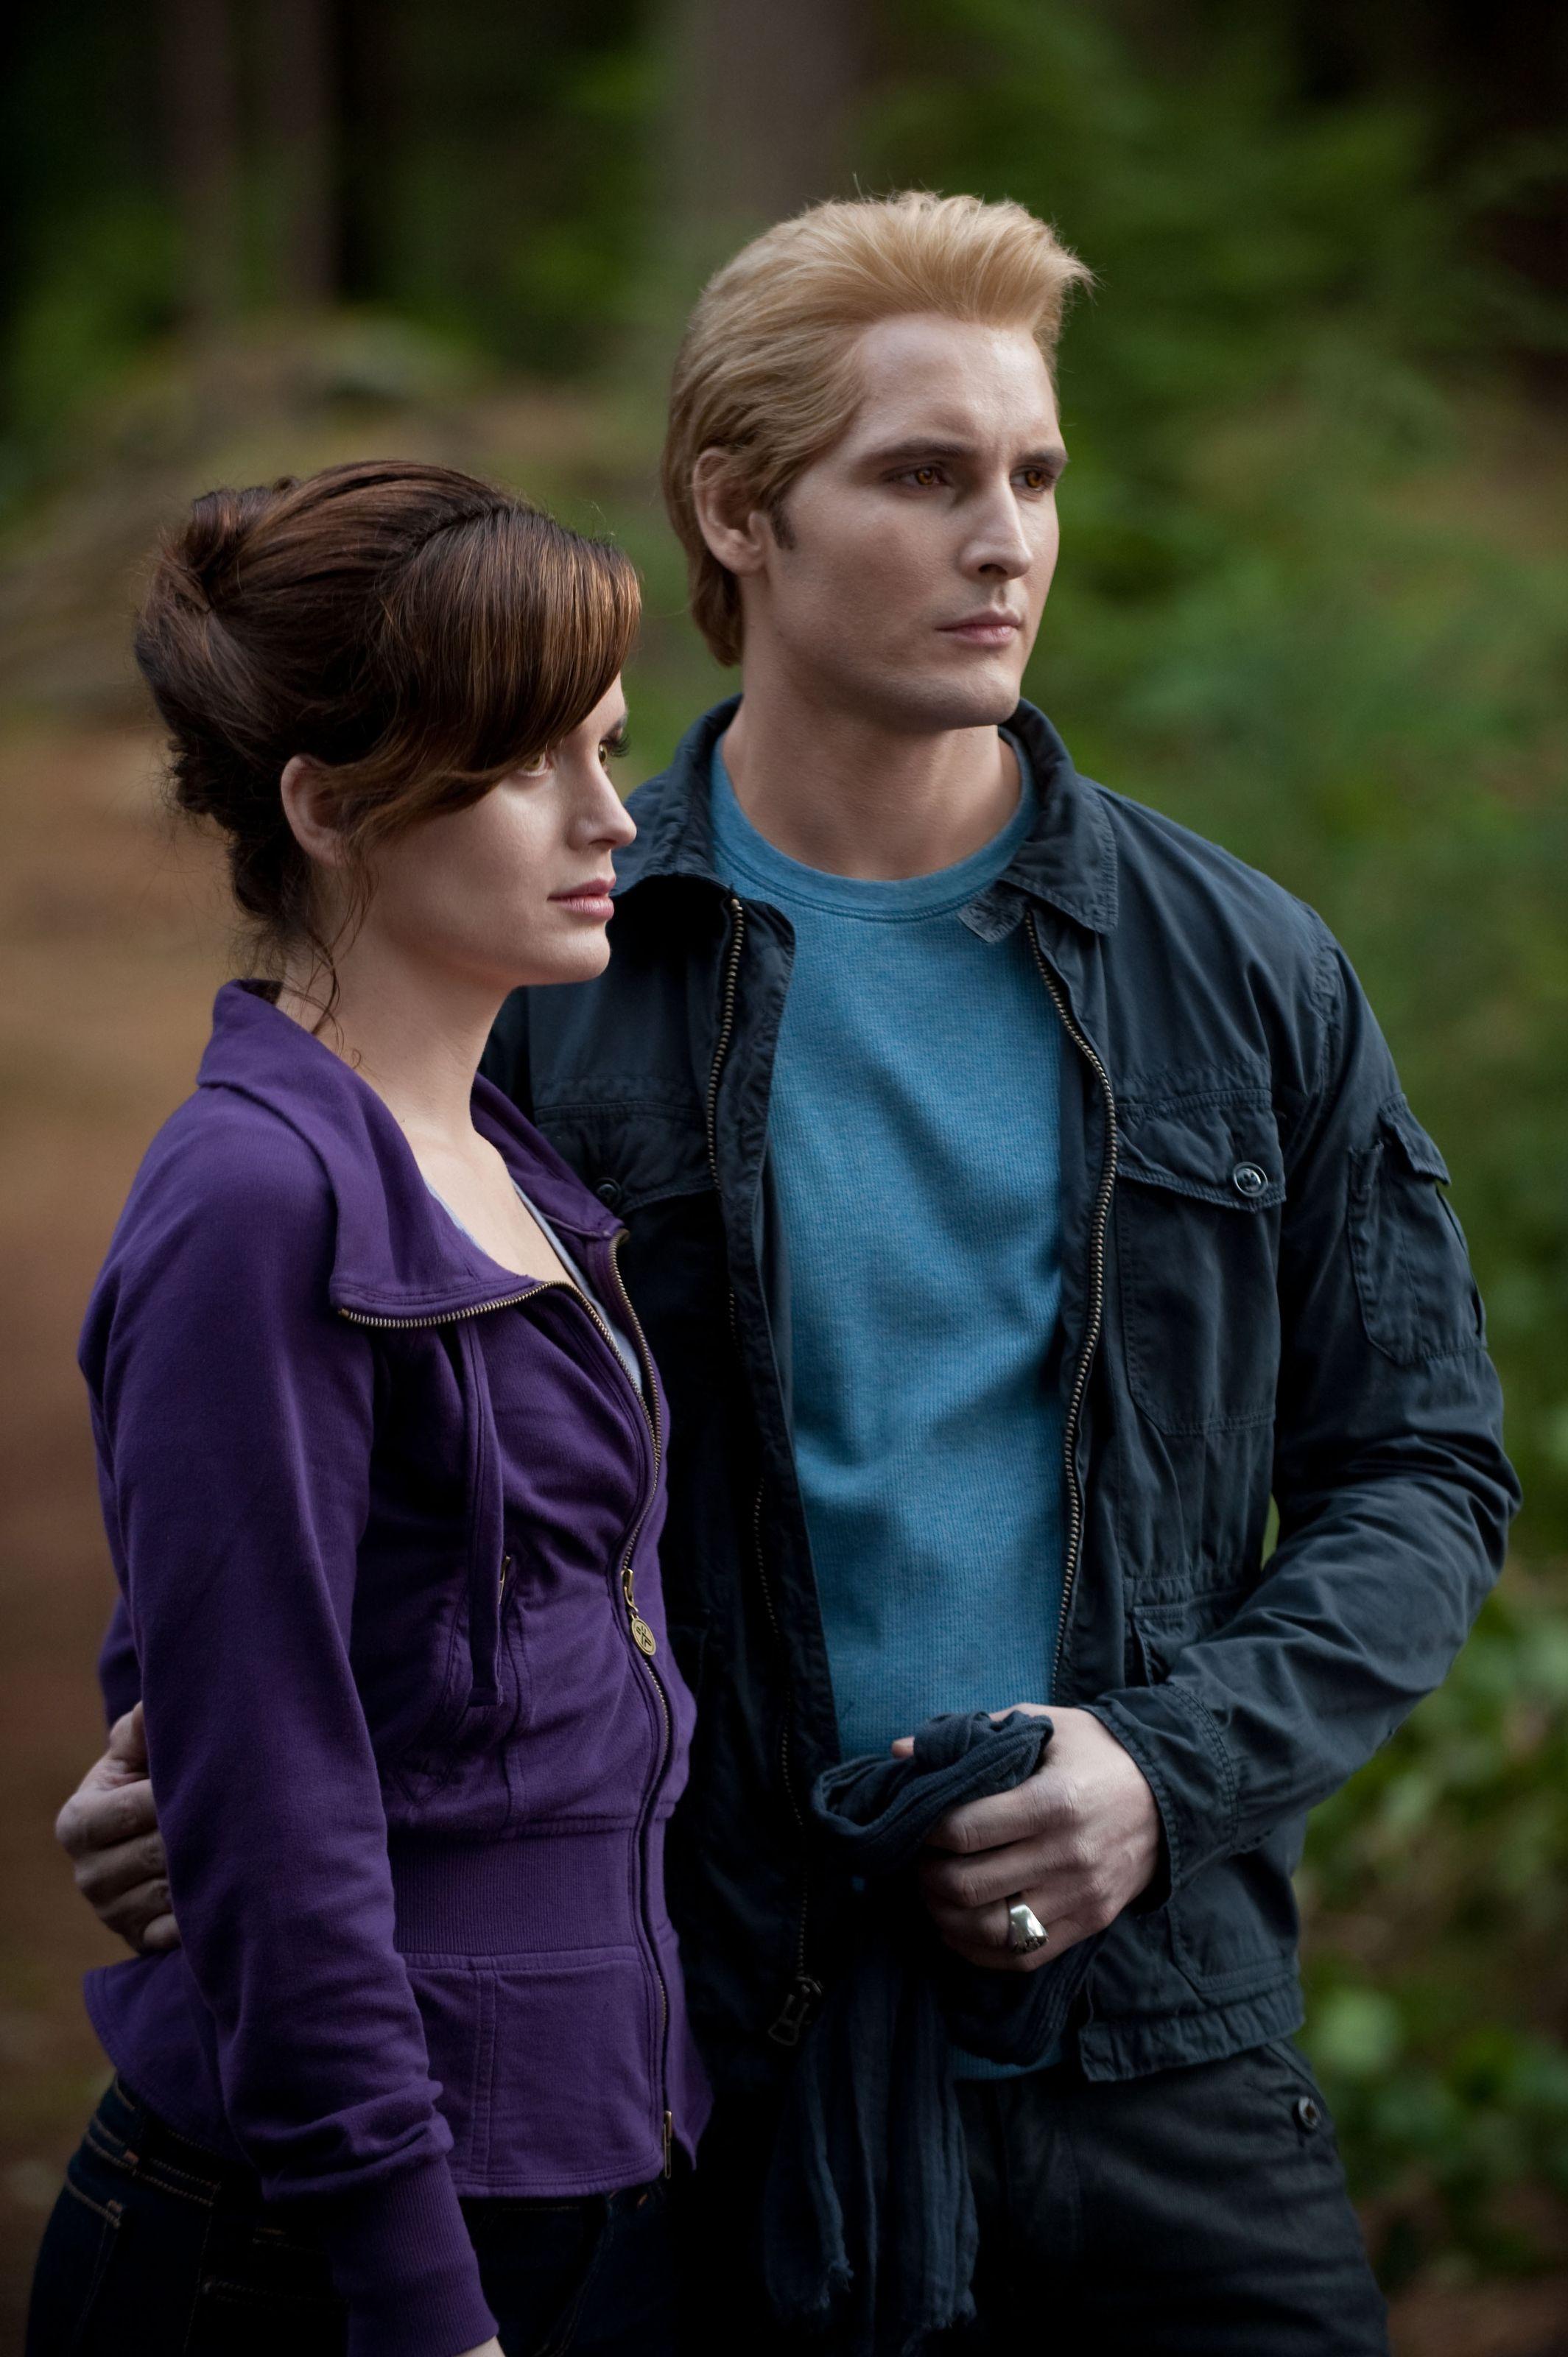 Esme and Carlisle - The Twilight Saga  Thank god they made